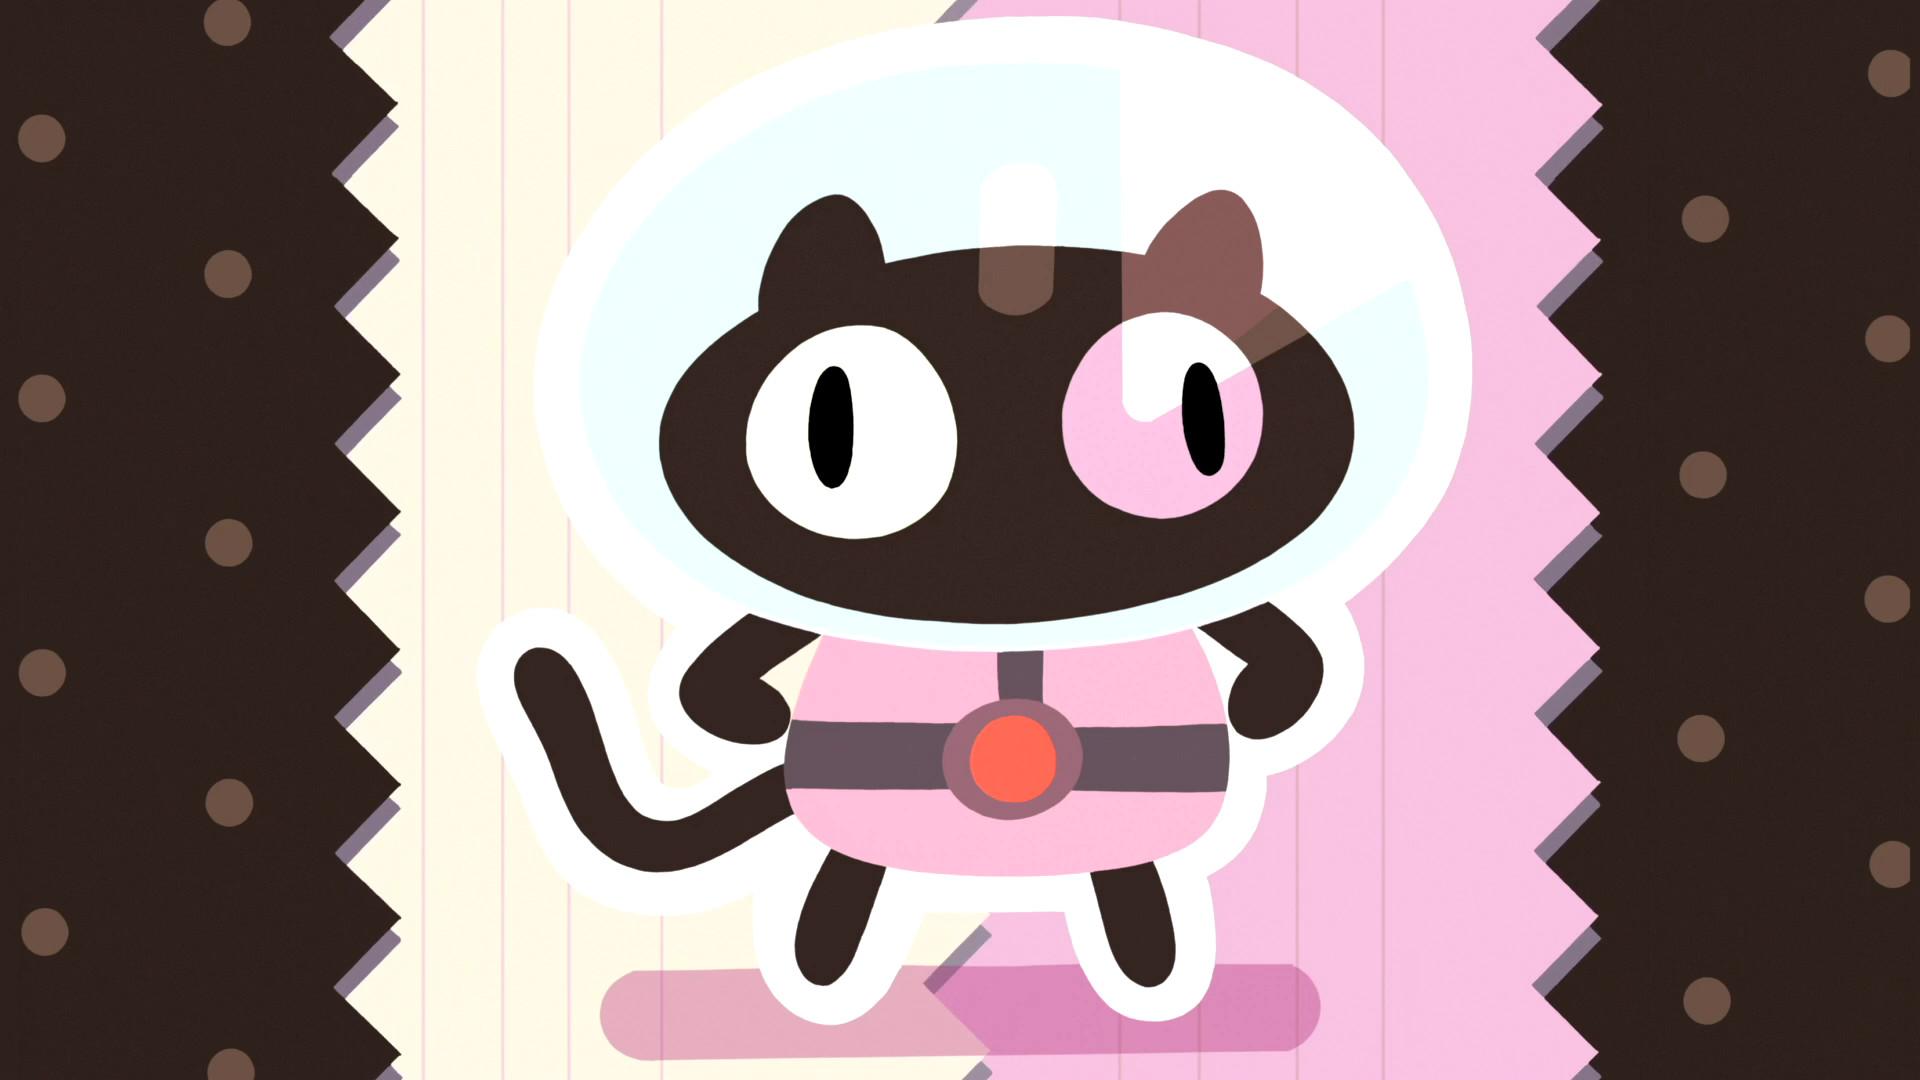 Cookie cat wallpaper! : stevenuniverse